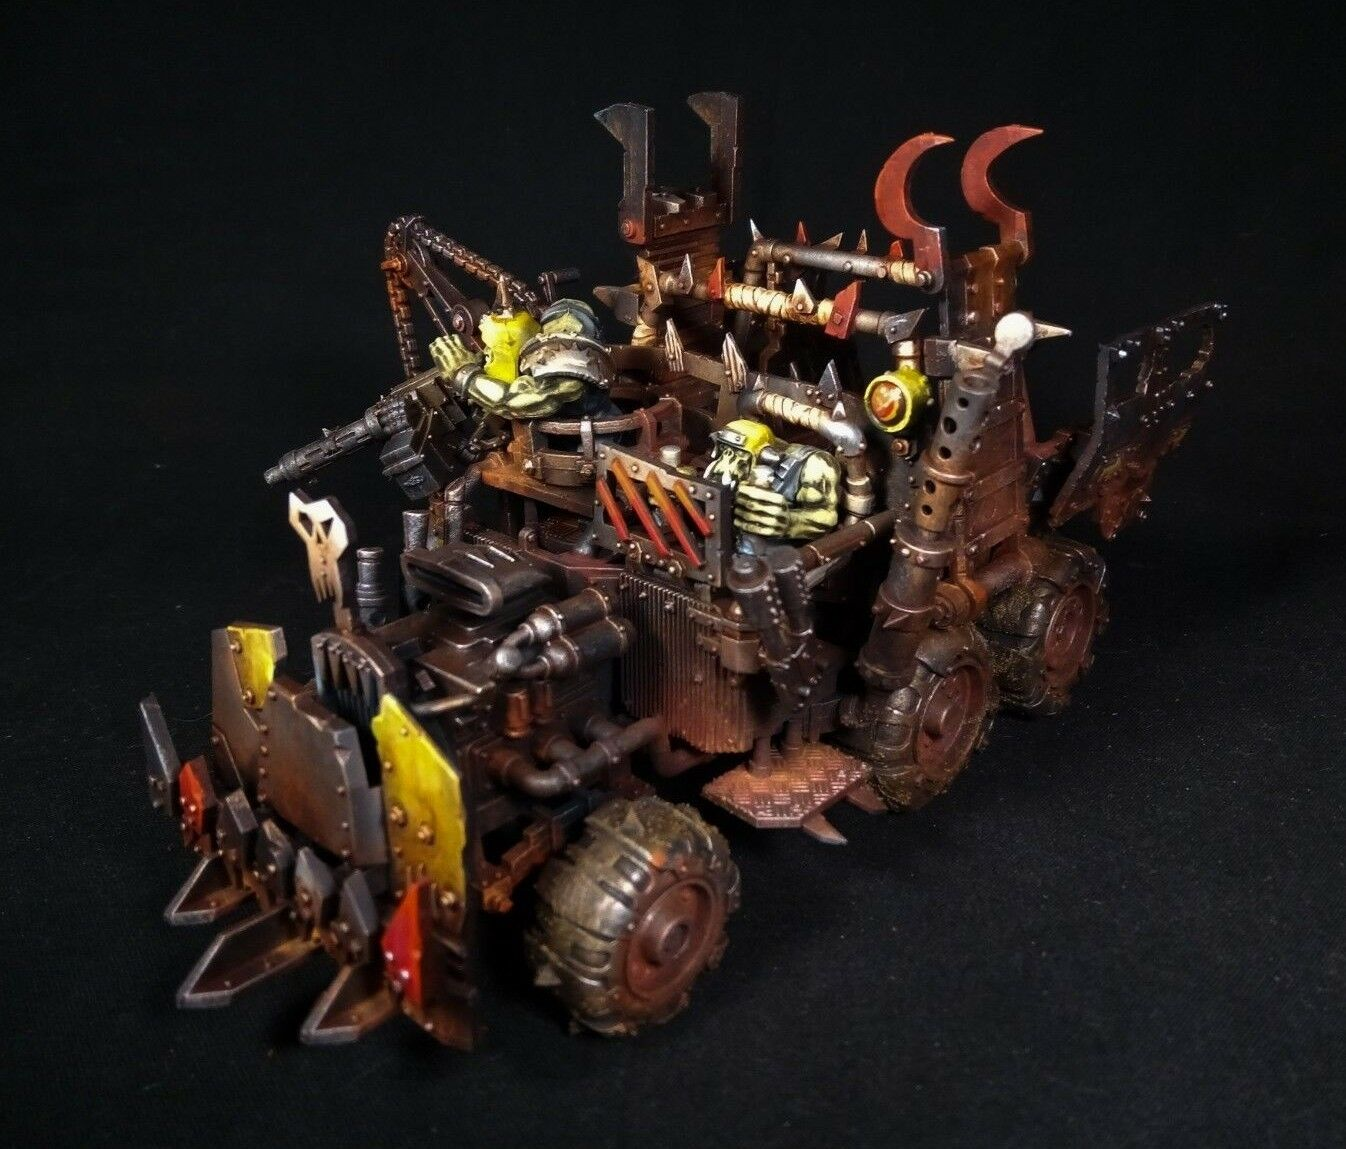 Warhammer 40k Ork trukk Pro pintado de comisión